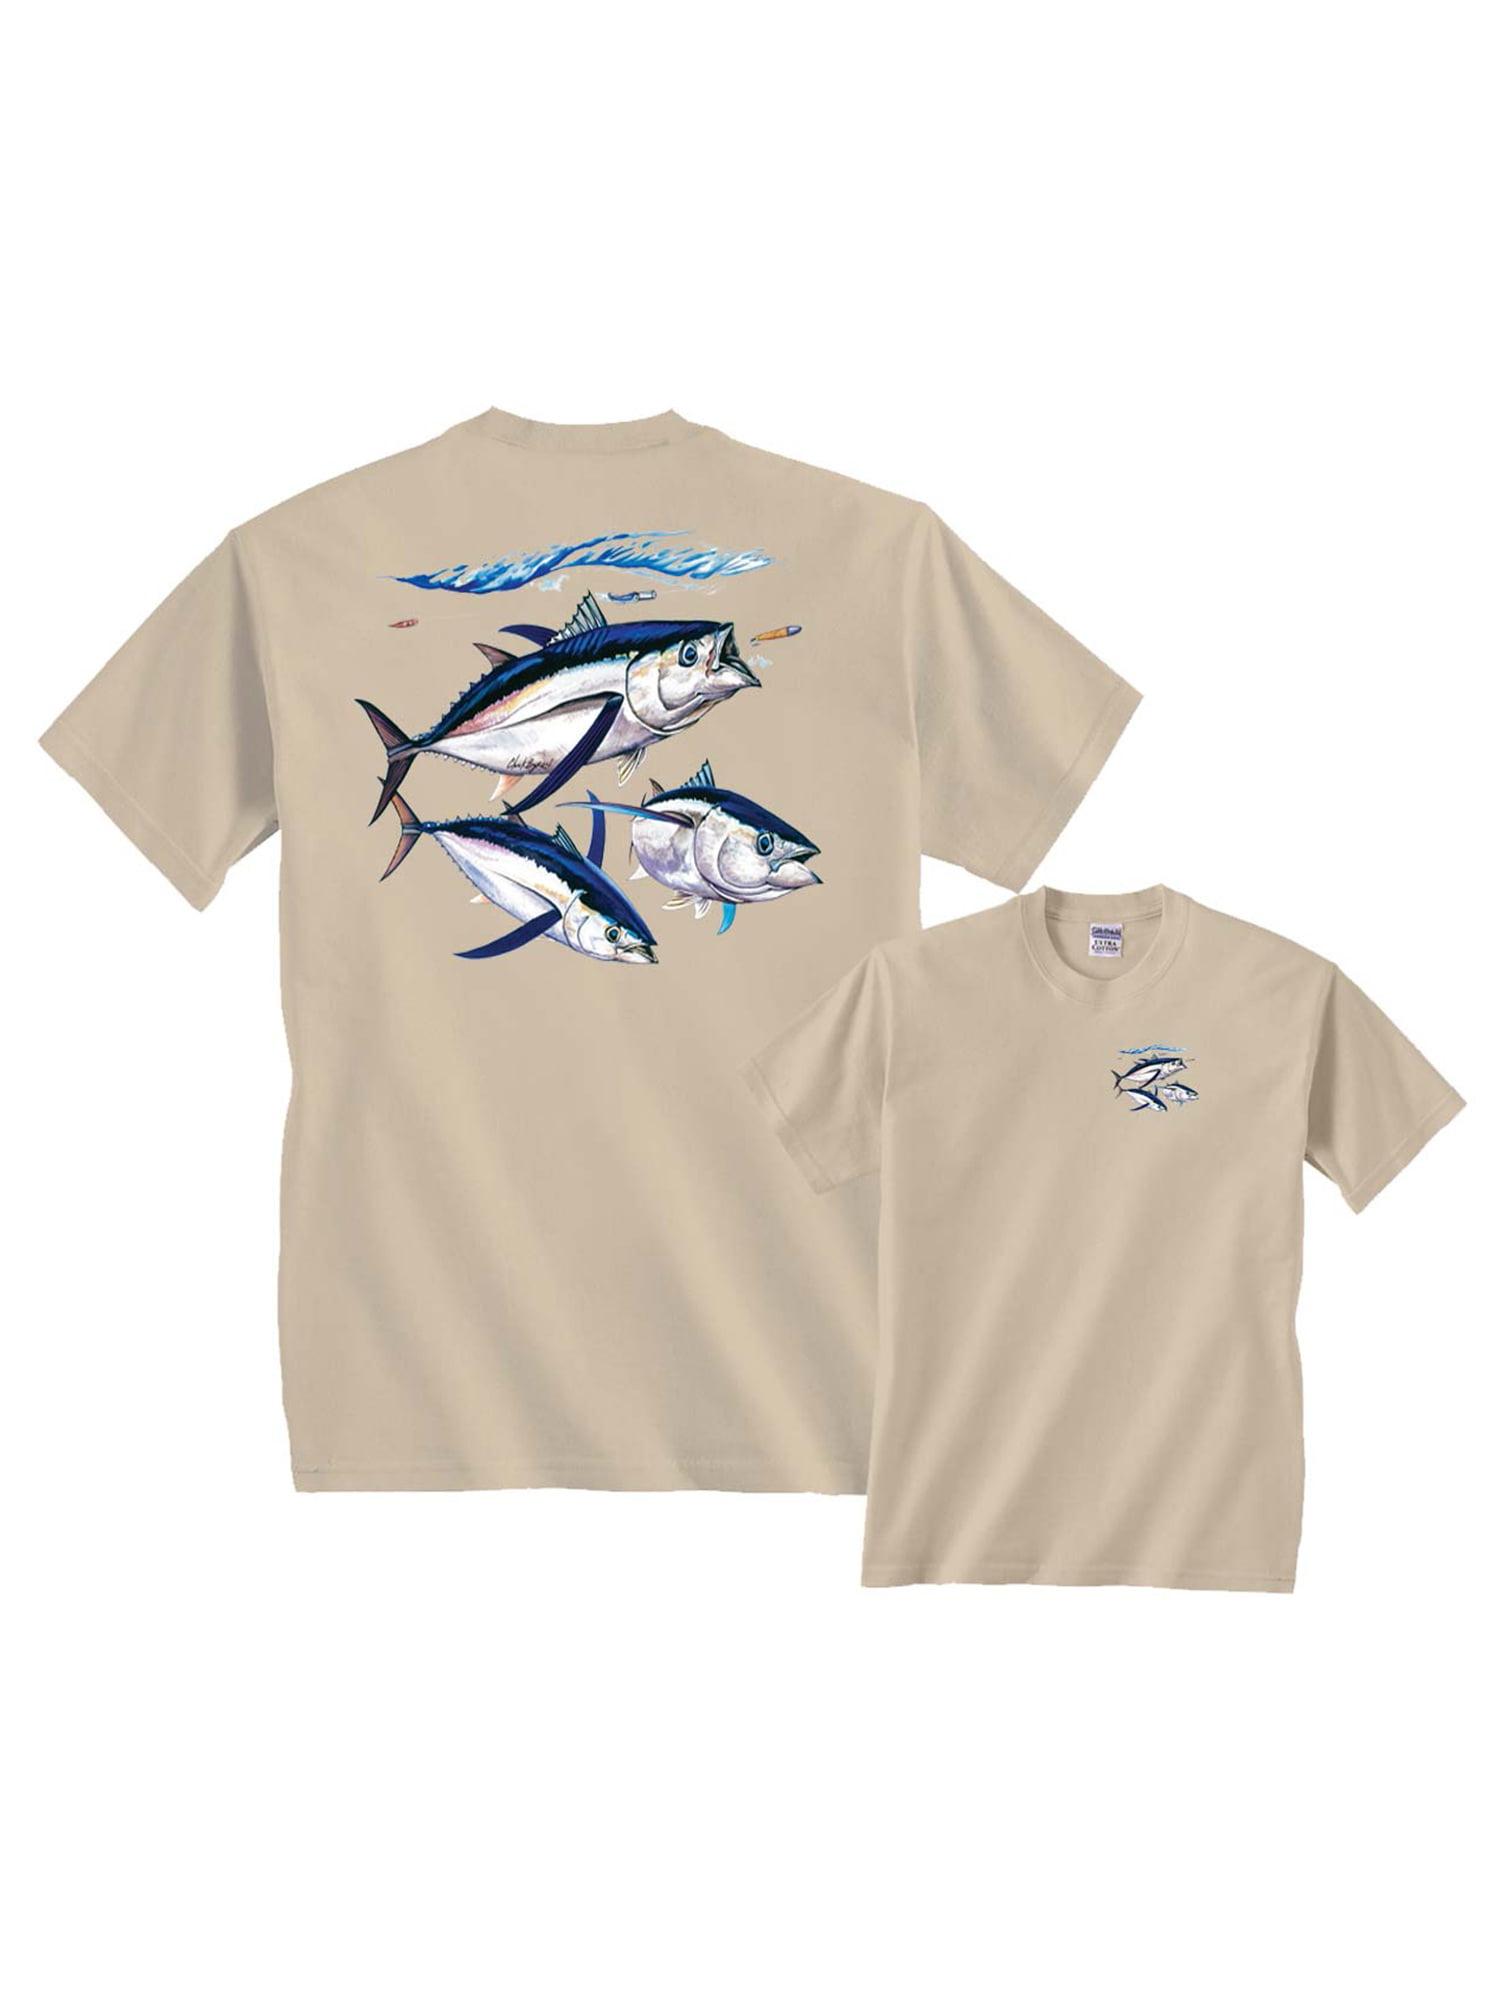 Albacore Tuna Fishing T-Shirt